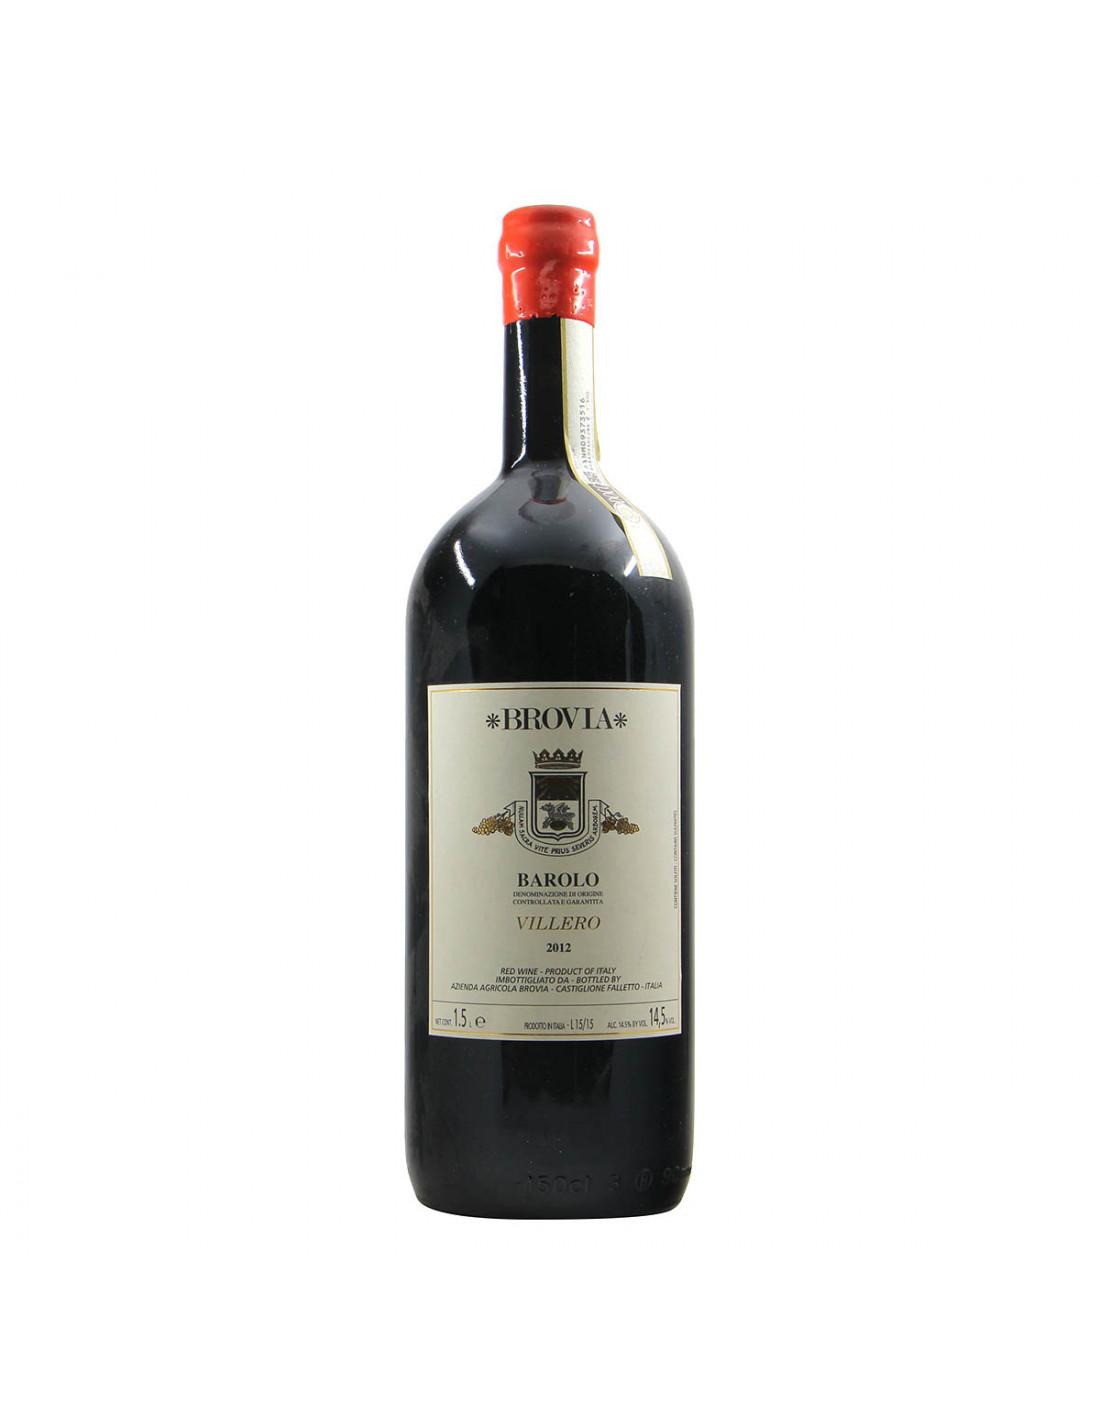 Brovia Barolo Villero Magnum 2012 Grandi Bottiglie